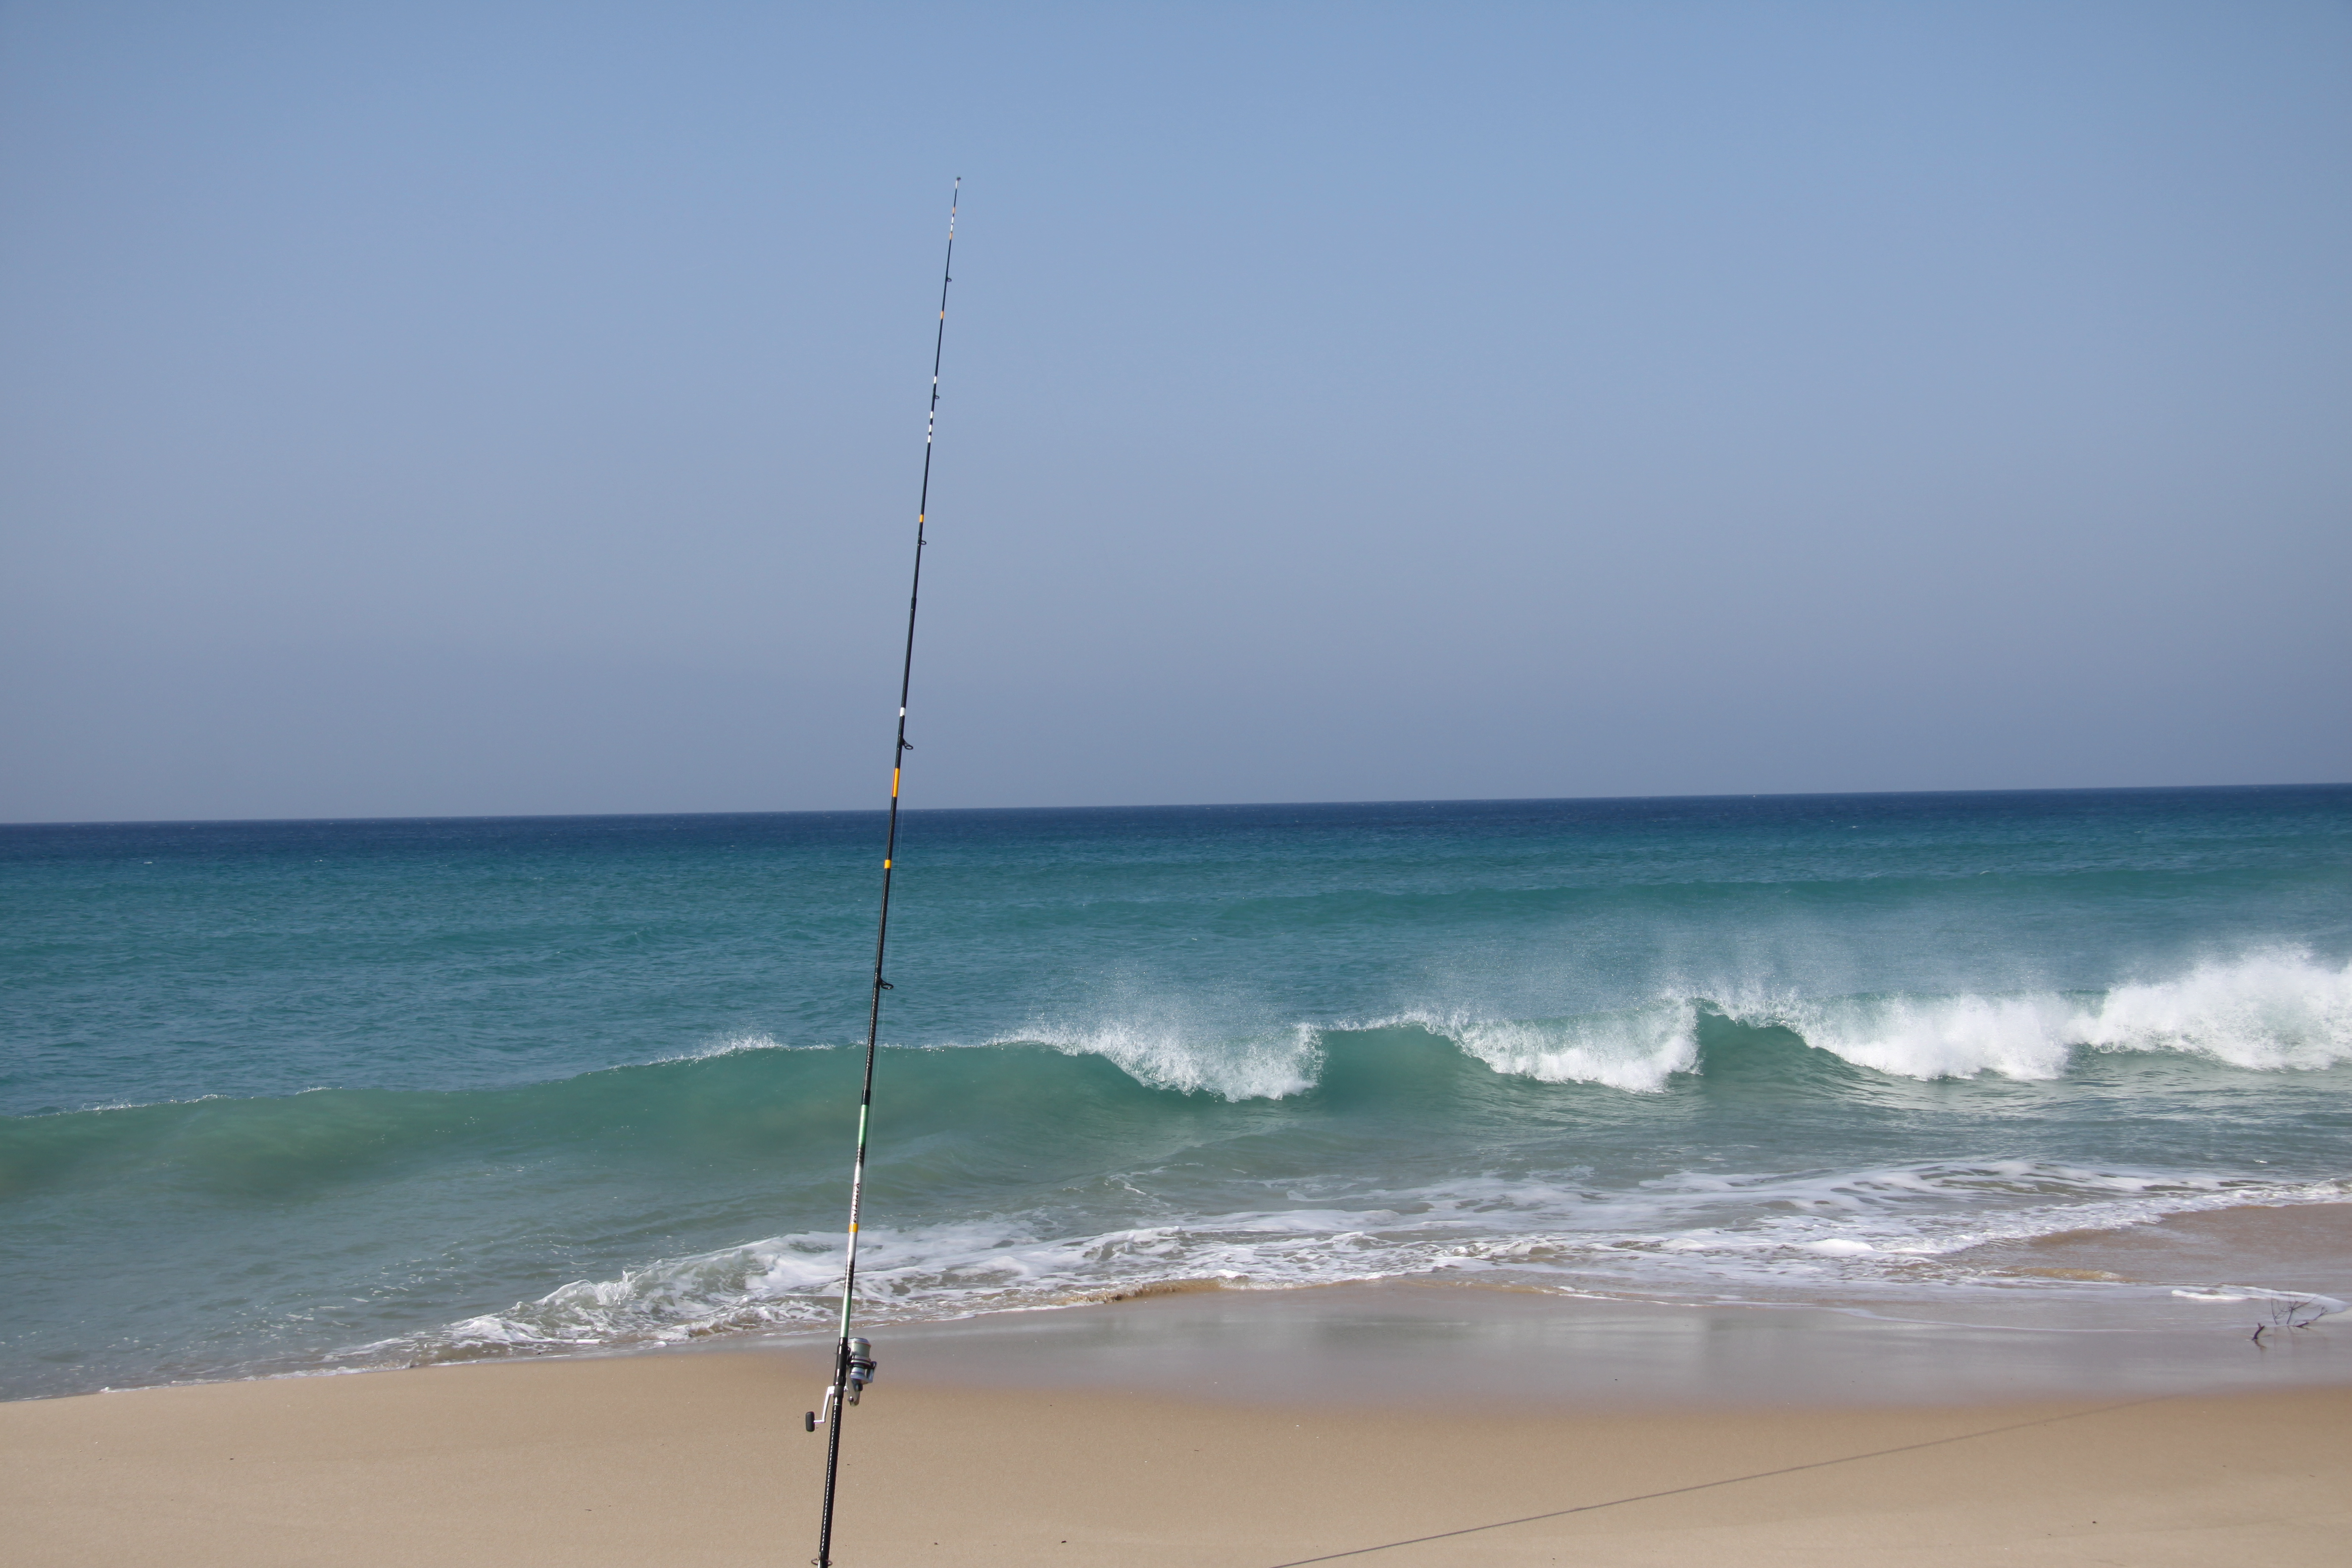 Fishing, tarifa, andalucia, www.andrewforbes.com